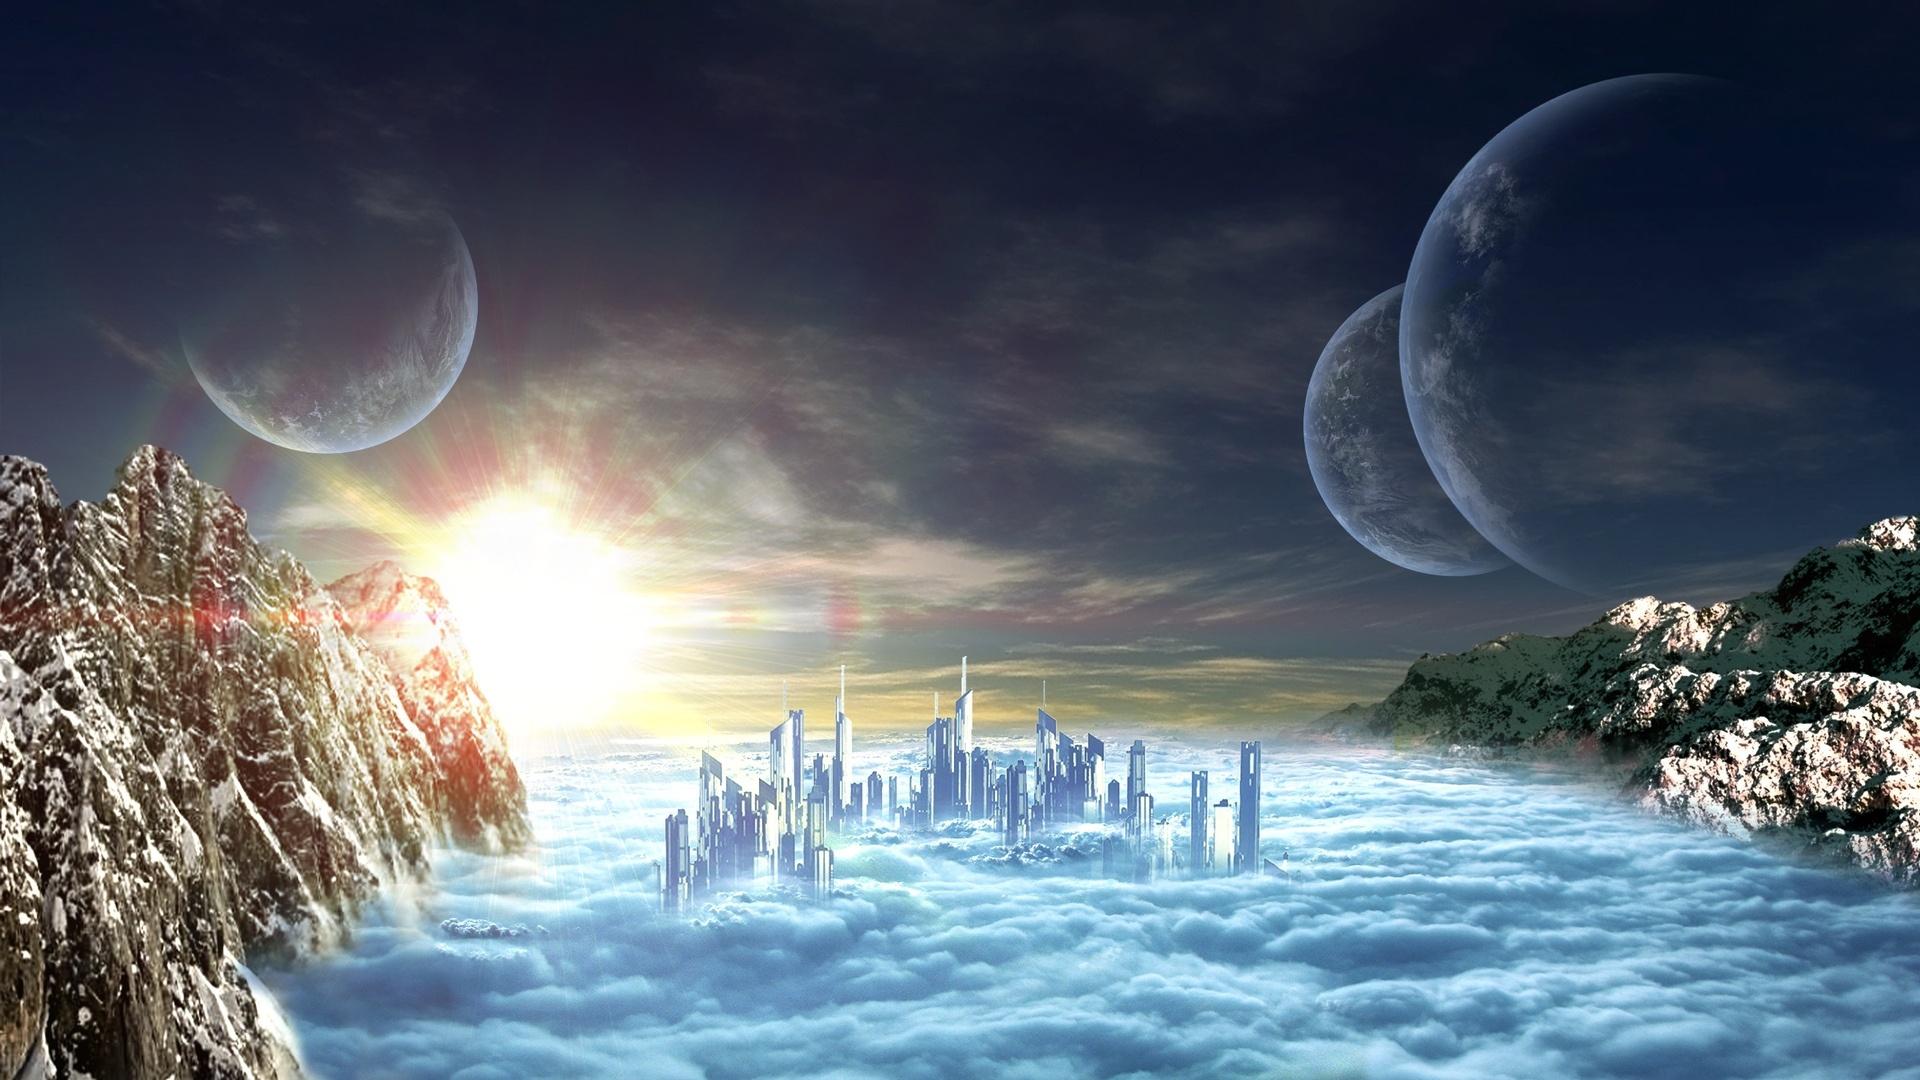 Alien Planet Art Wallpaper